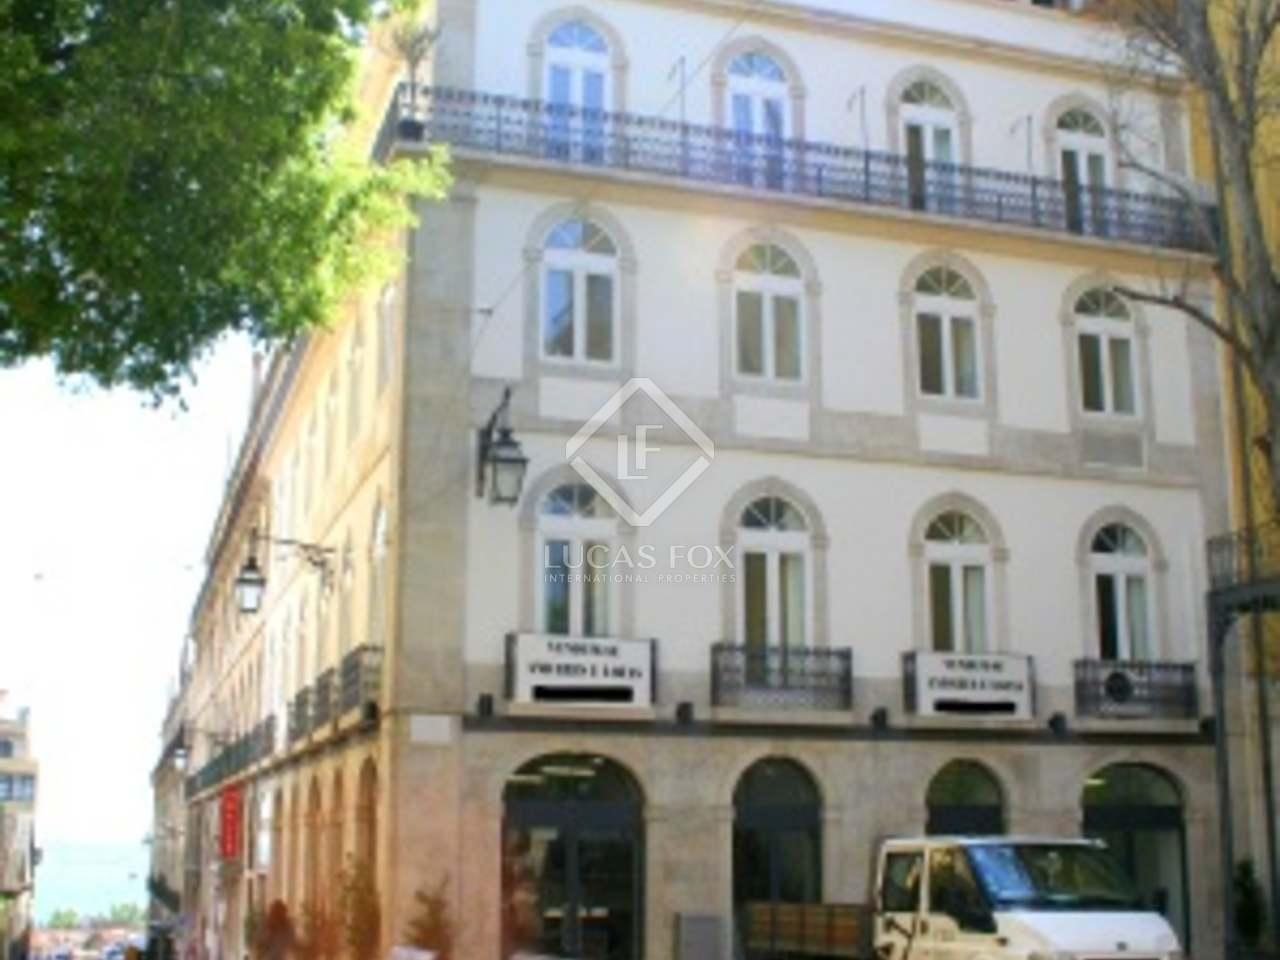 2-bedroom Chaido apartment for sale, Lisbon